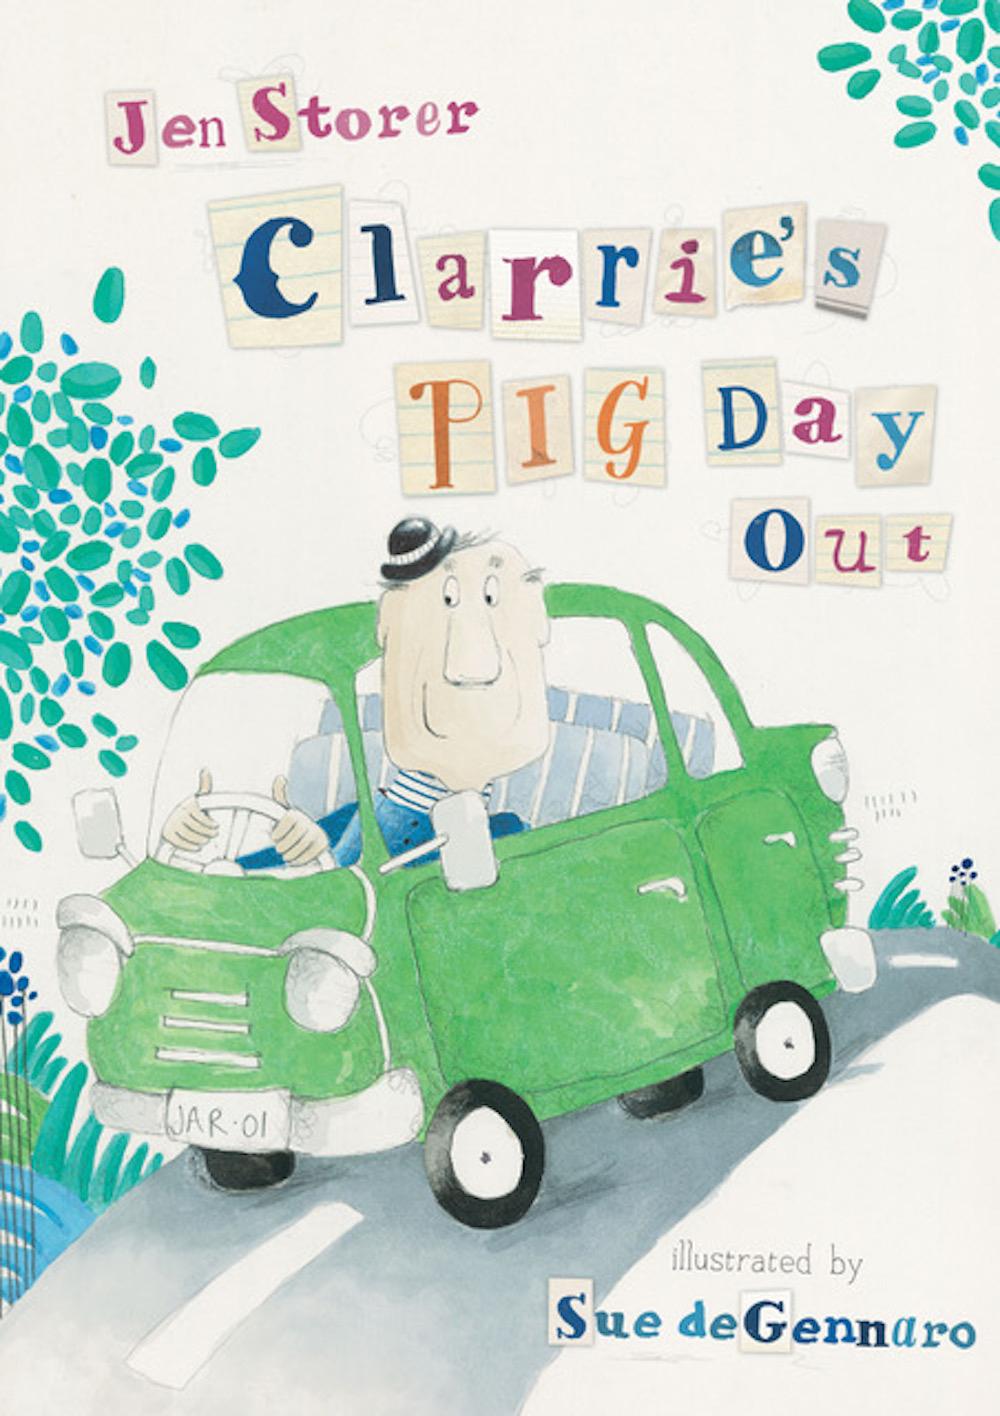 Clarrie's Pig Day Out - Jen Storer Sue deGennaro HarperCollins